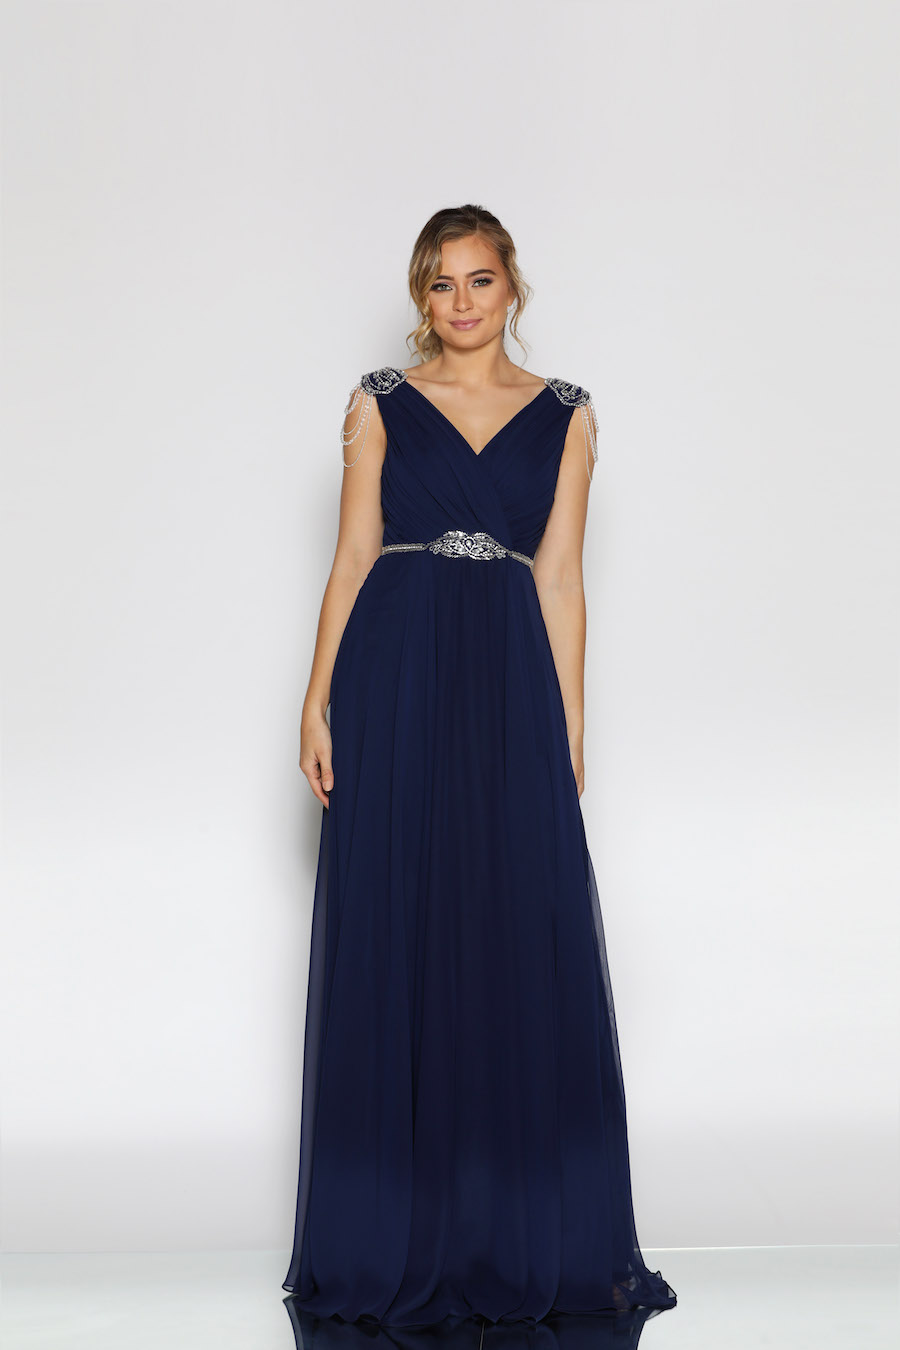 V neckline gathered bust line dress with embellishment on shoulders waistband full skirt